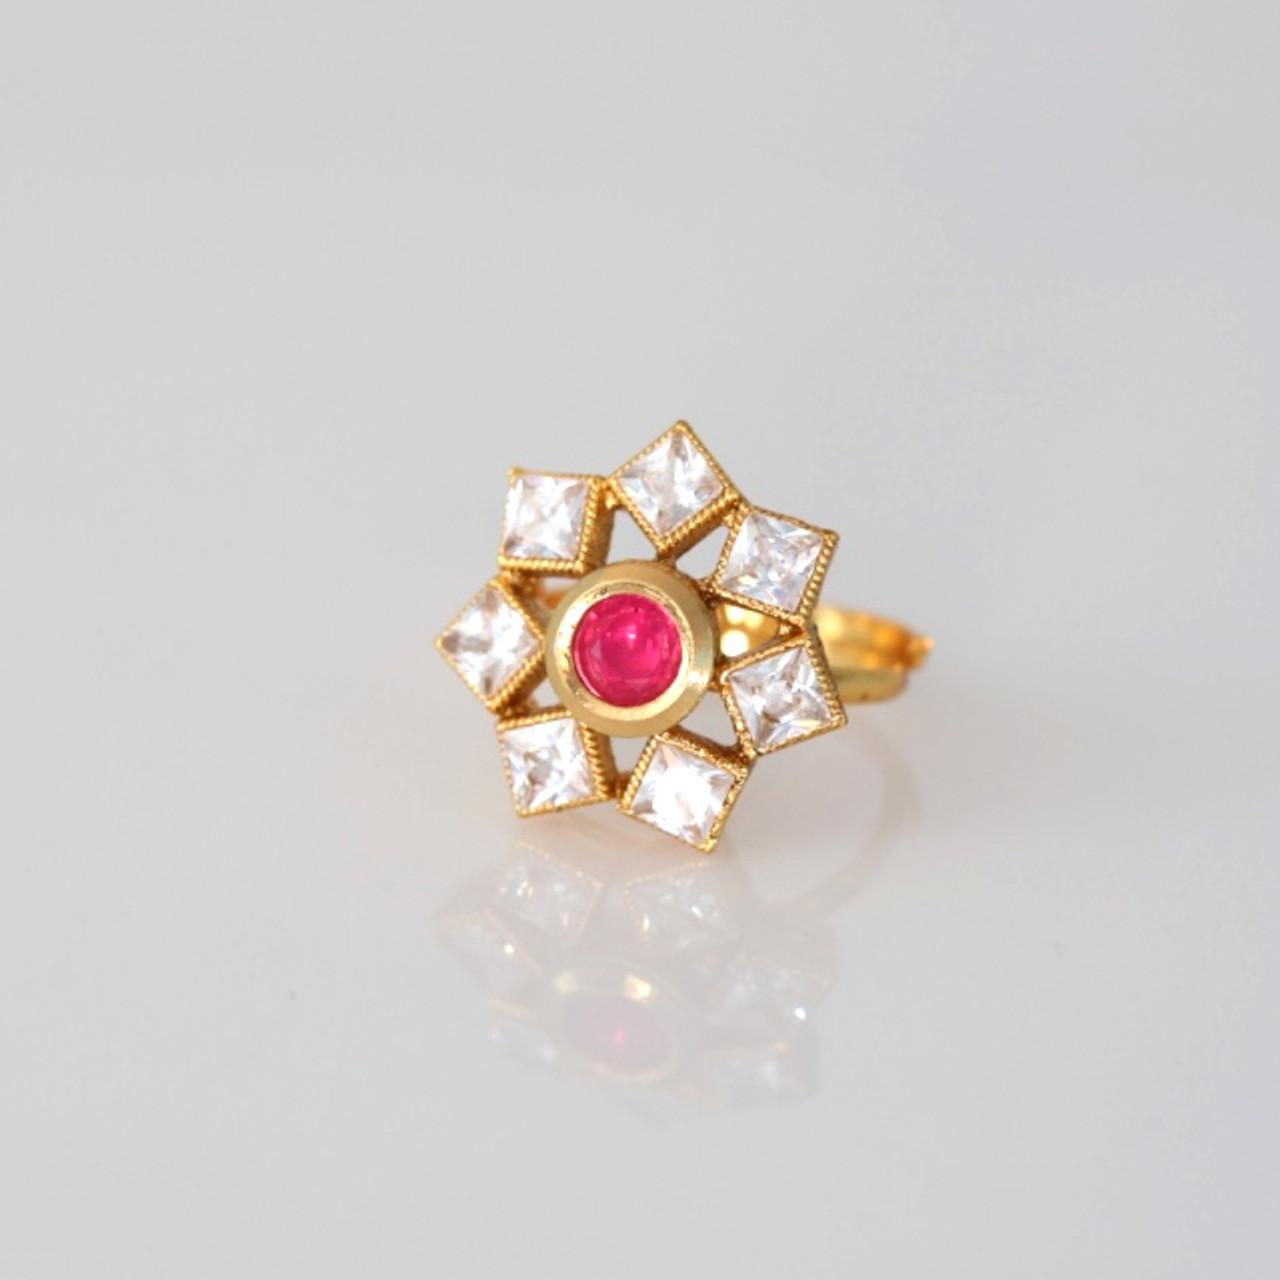 Gold Plated AD// Polki Wedding New Adjustable Finger Ring Indian Handmade Women